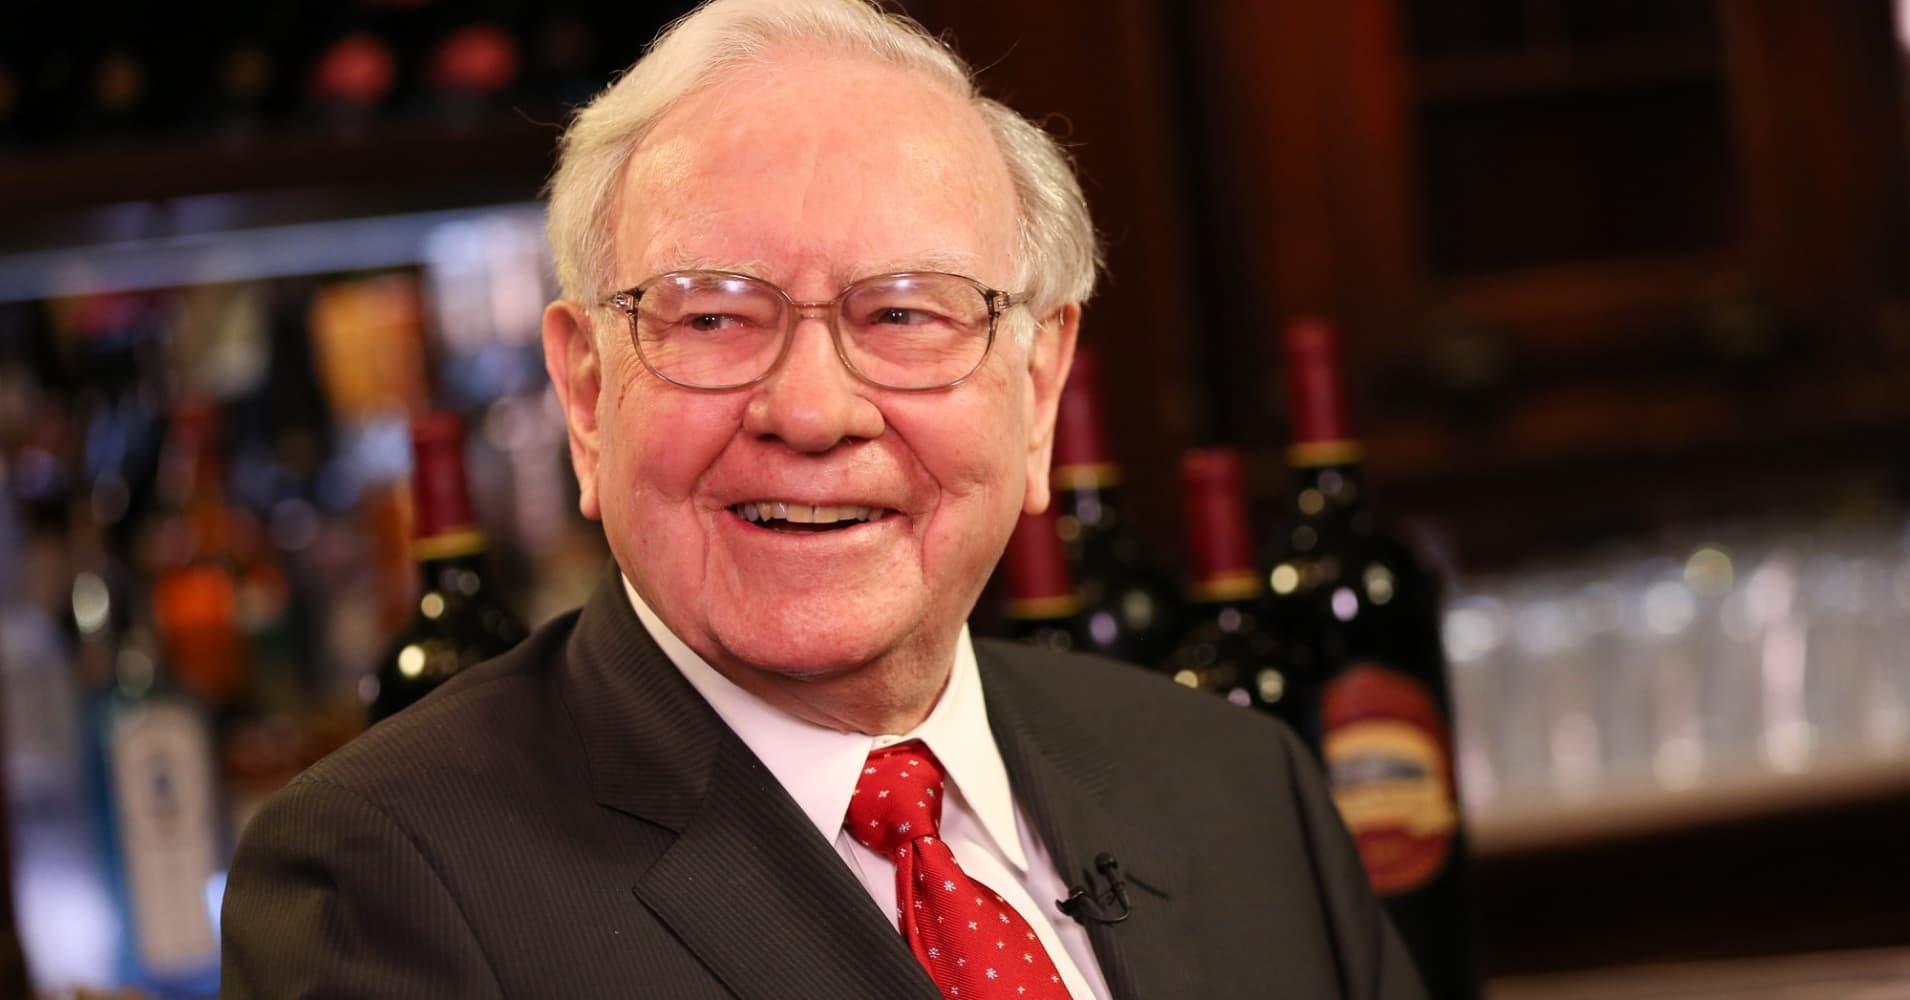 Warren Buffett, one of the most successful investors in the world